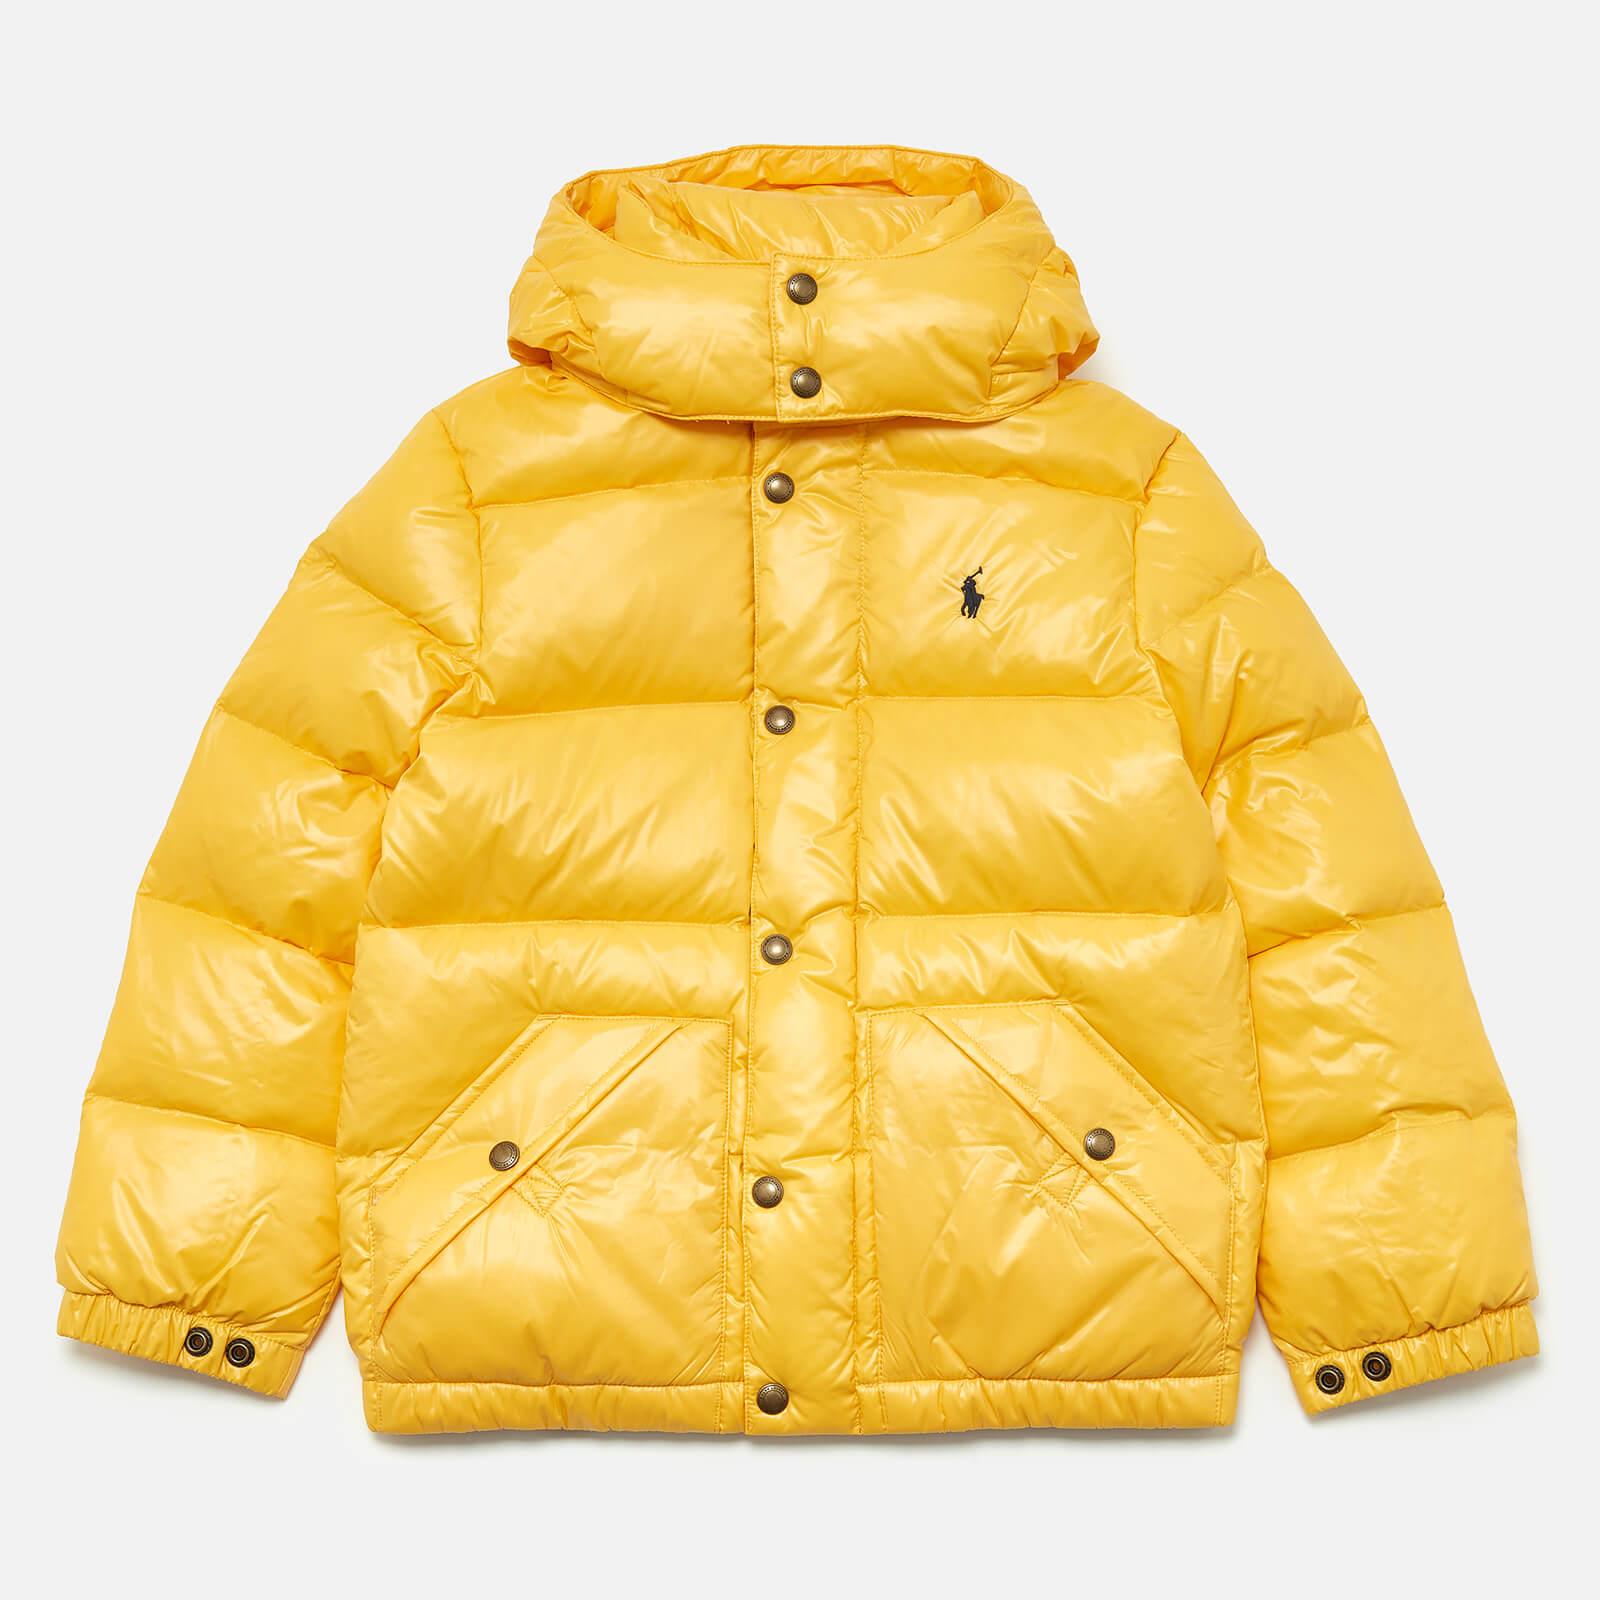 Polo Ralph Lauren Boys' Padded Jacket - Yellow - 6 Years